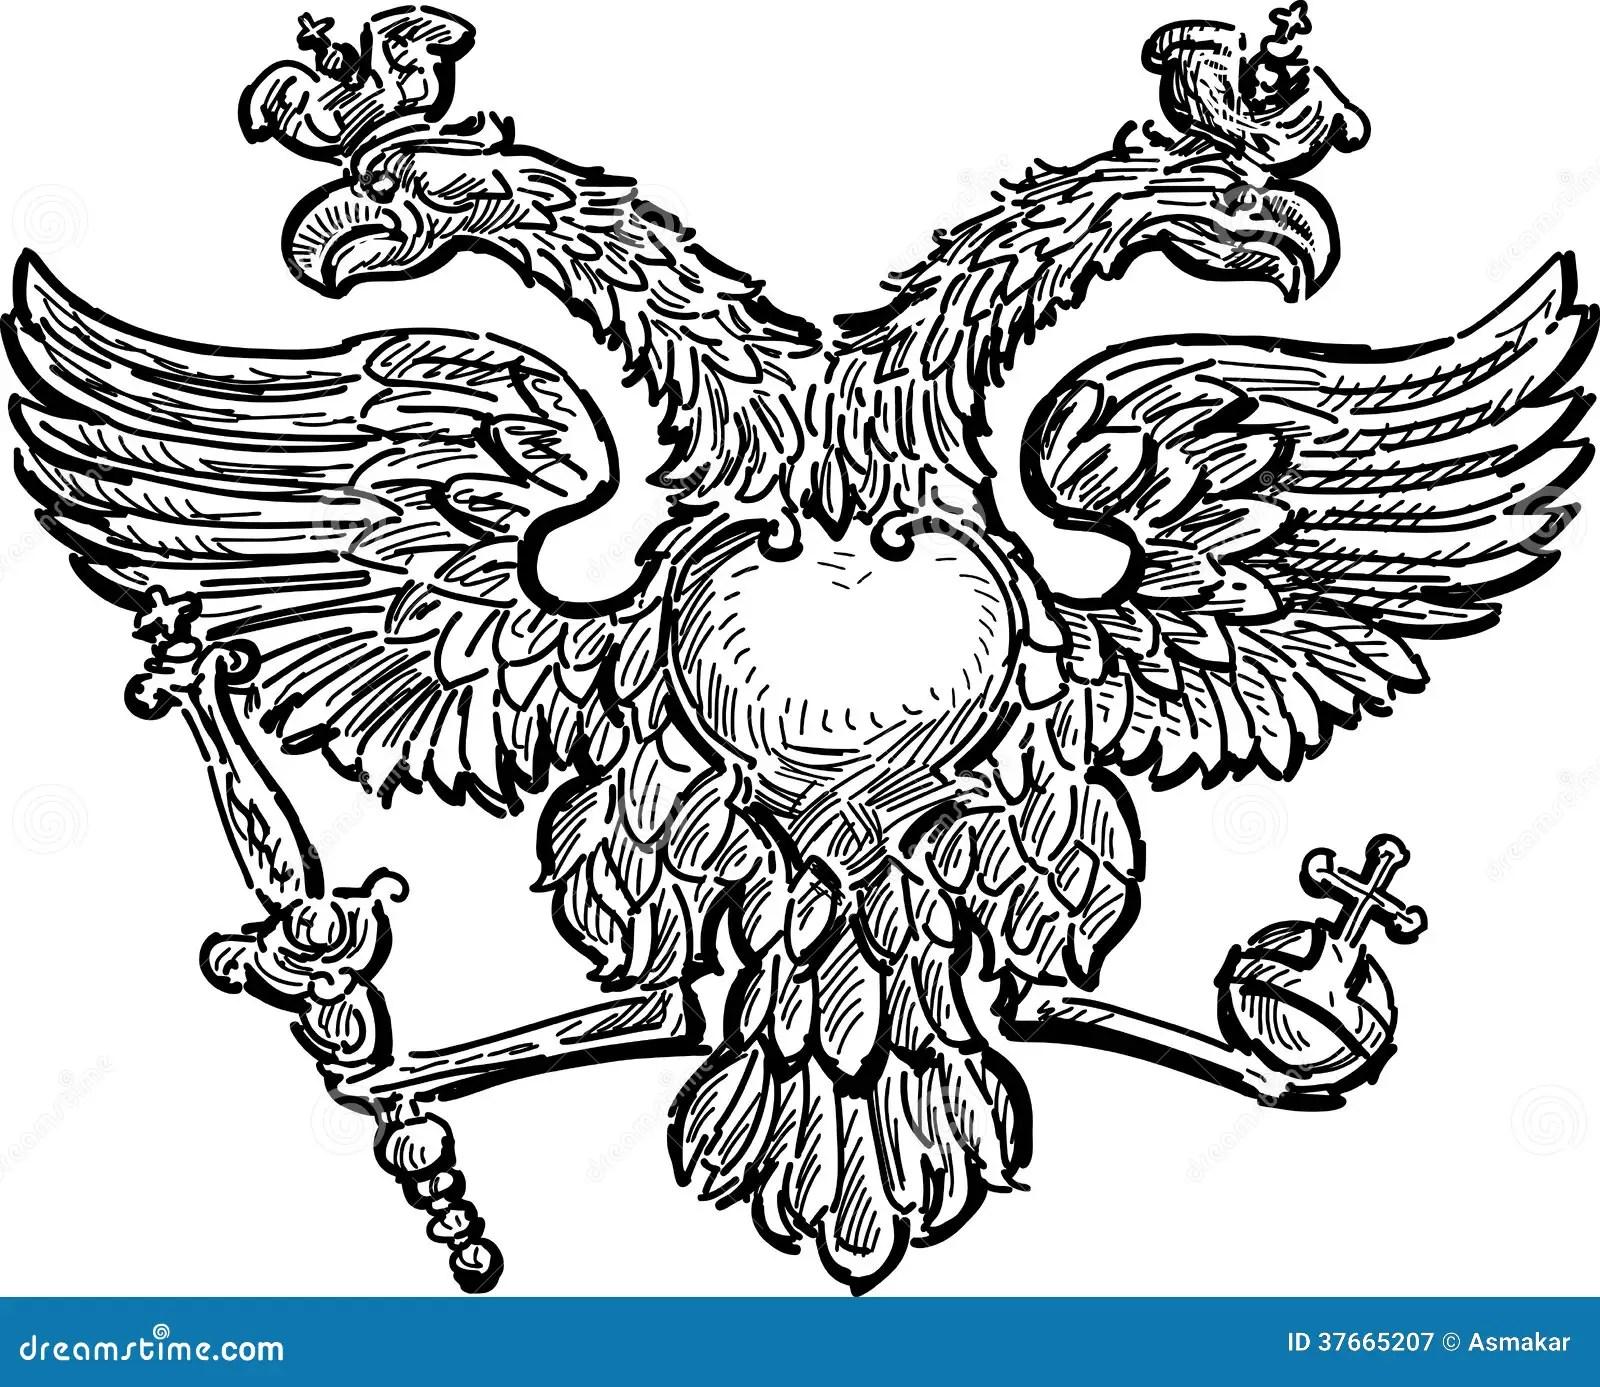 Double-headed eagle stock vector. Illustration of bird